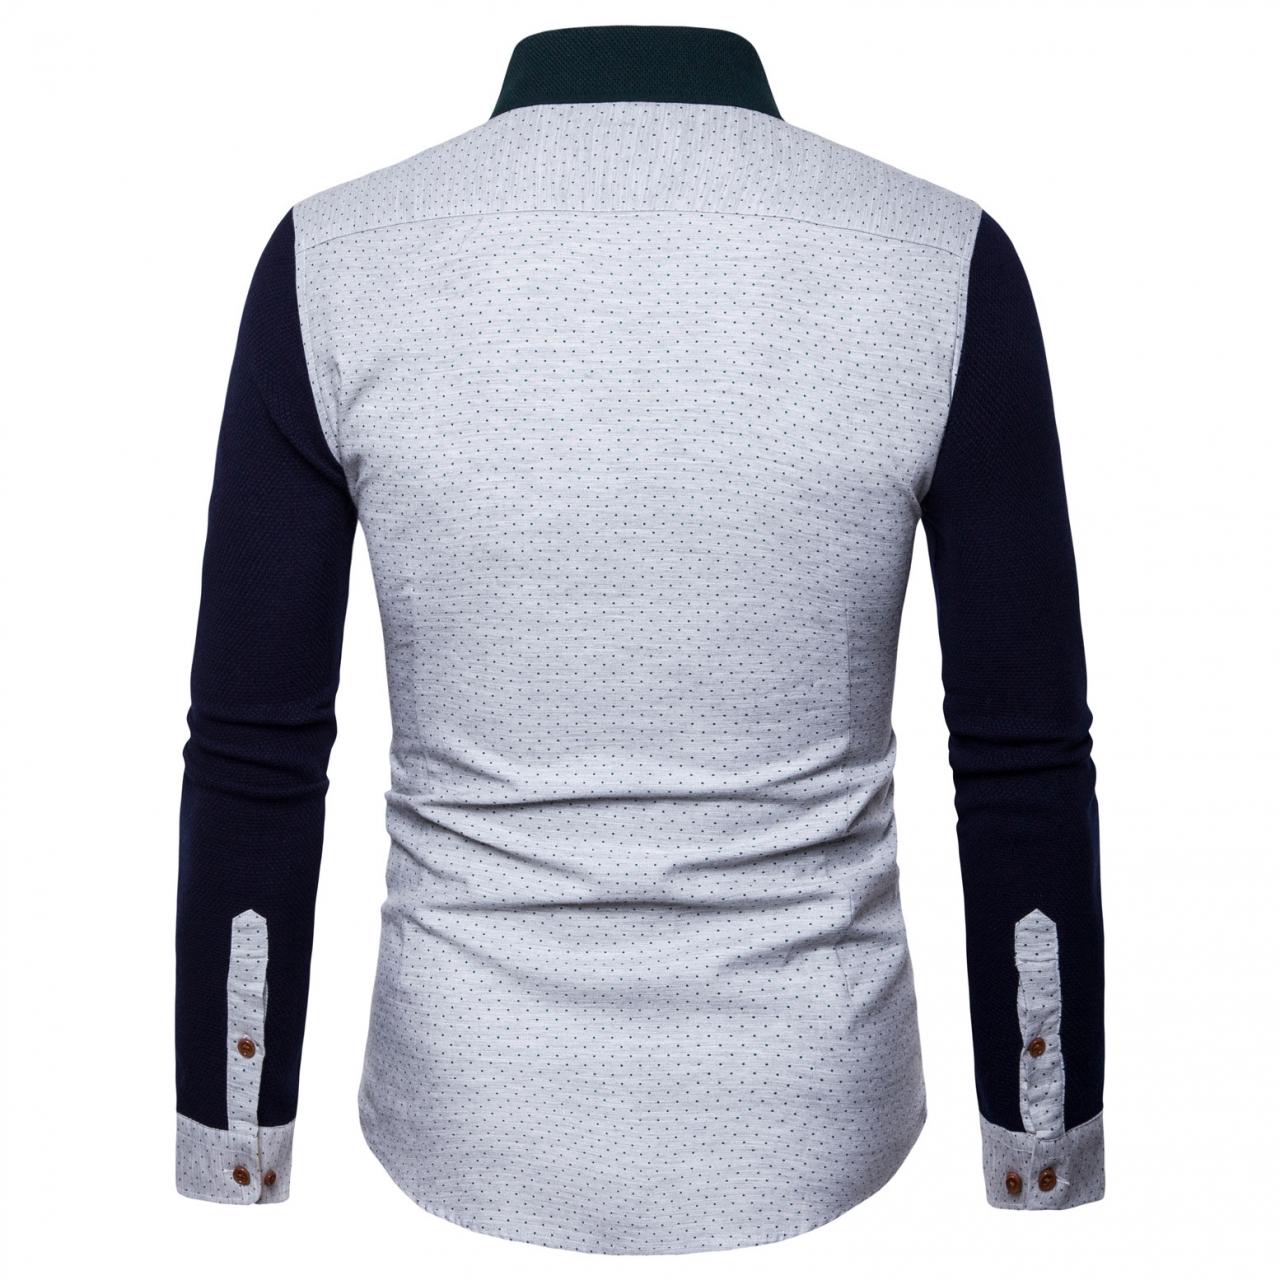 Kilimall  Autumn New style men s shirts pure cotton shirts fashion ... b3285168d4f2